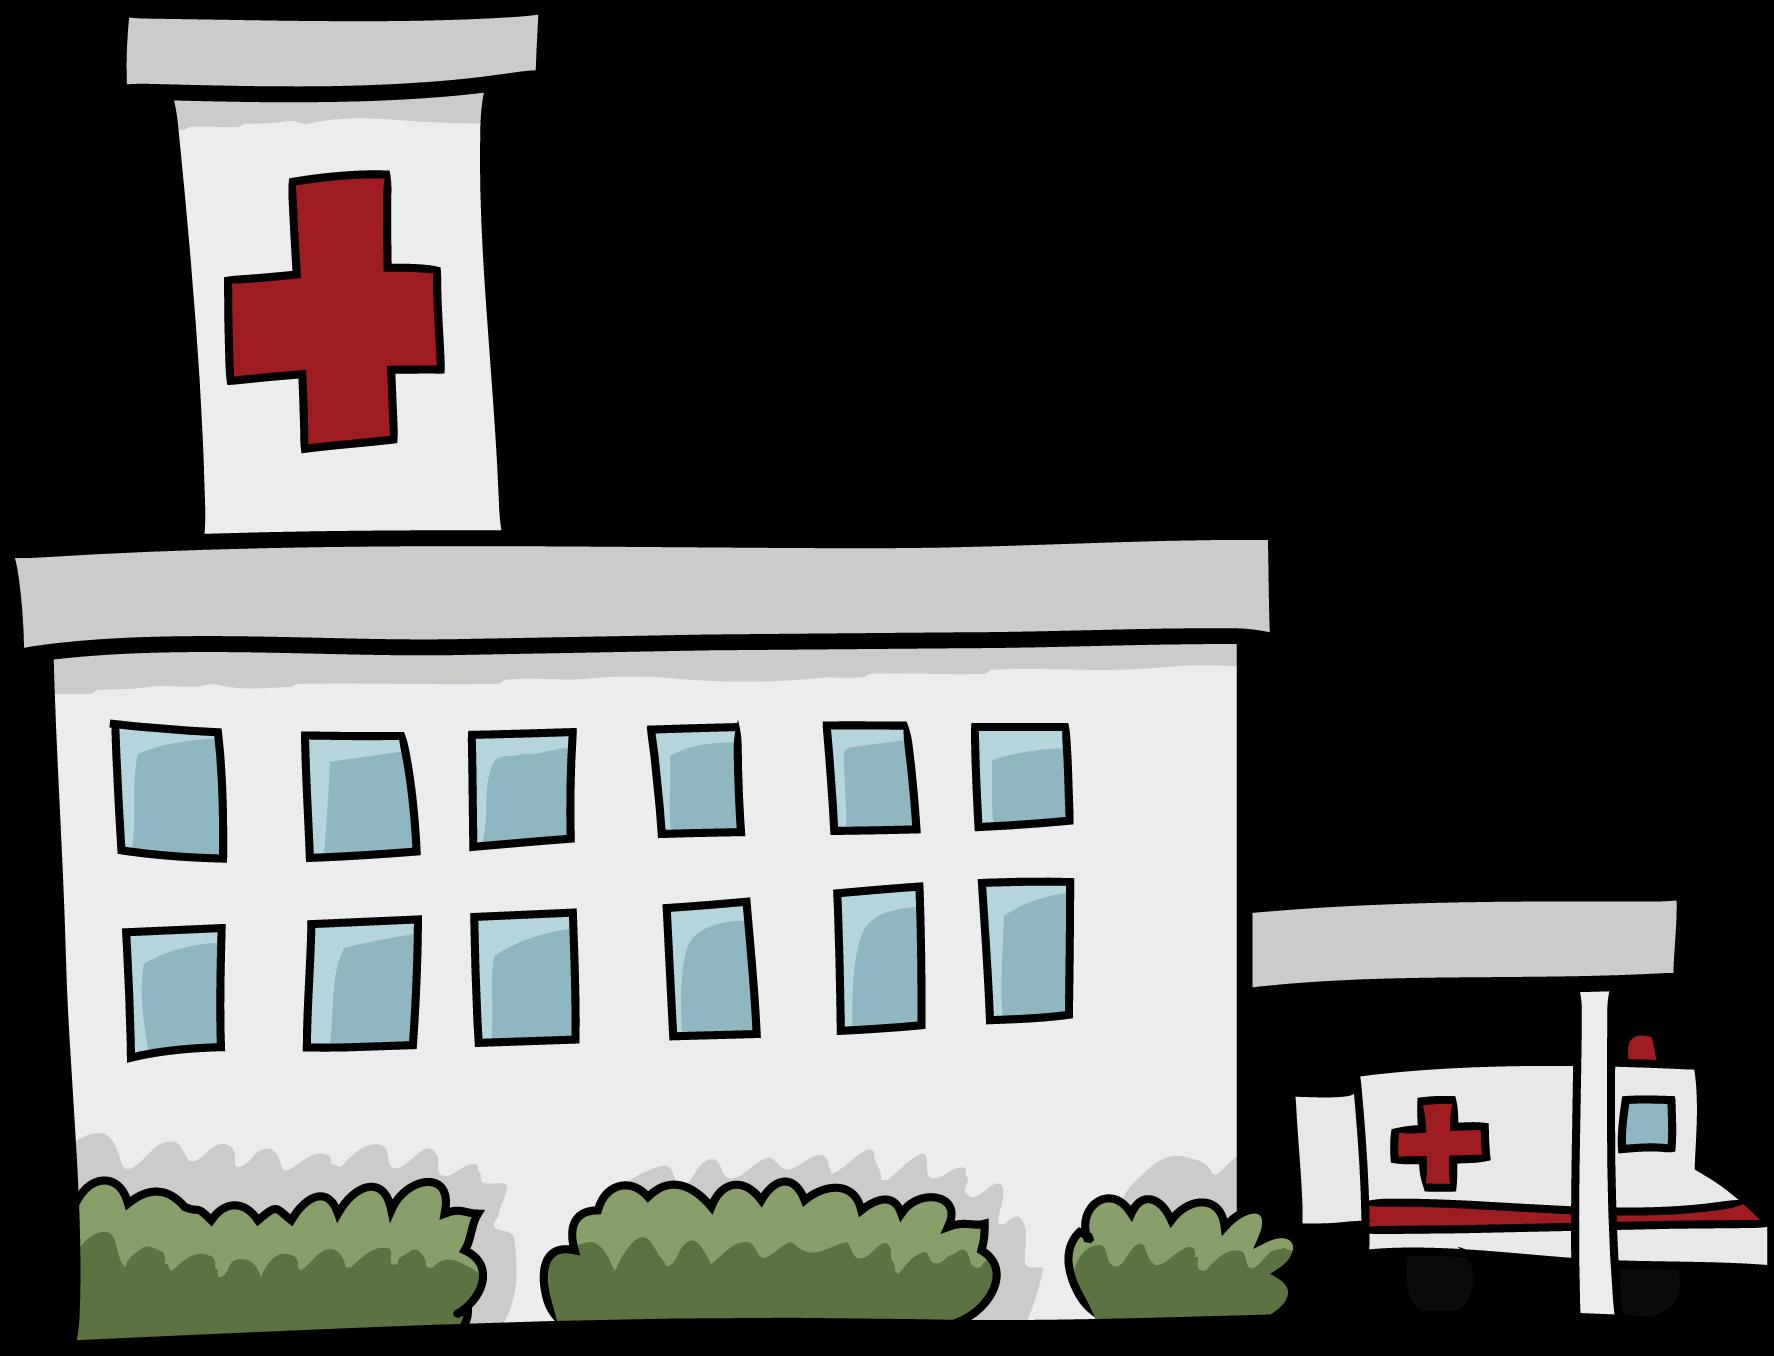 hospital clipart clipart panda free clipart images rh clipartpanda com Free Clip Art Hospital Patient Hospital Humor Clip Art Free